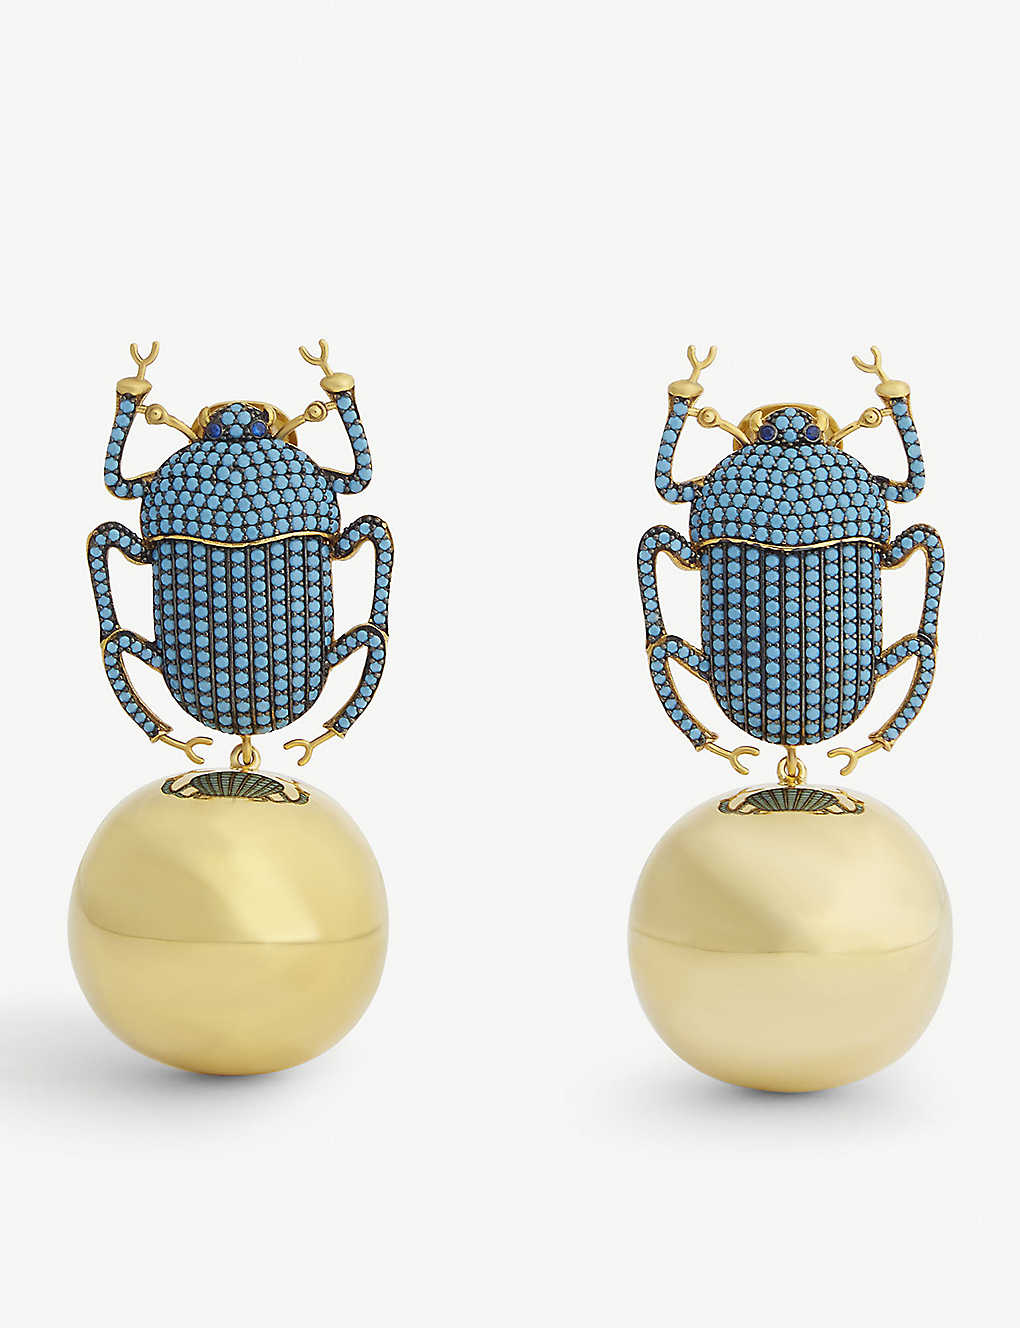 f249442cf8dc1 BEGUM KHAN - Pharaoh party gold-plated drop earrings | Selfridges.com